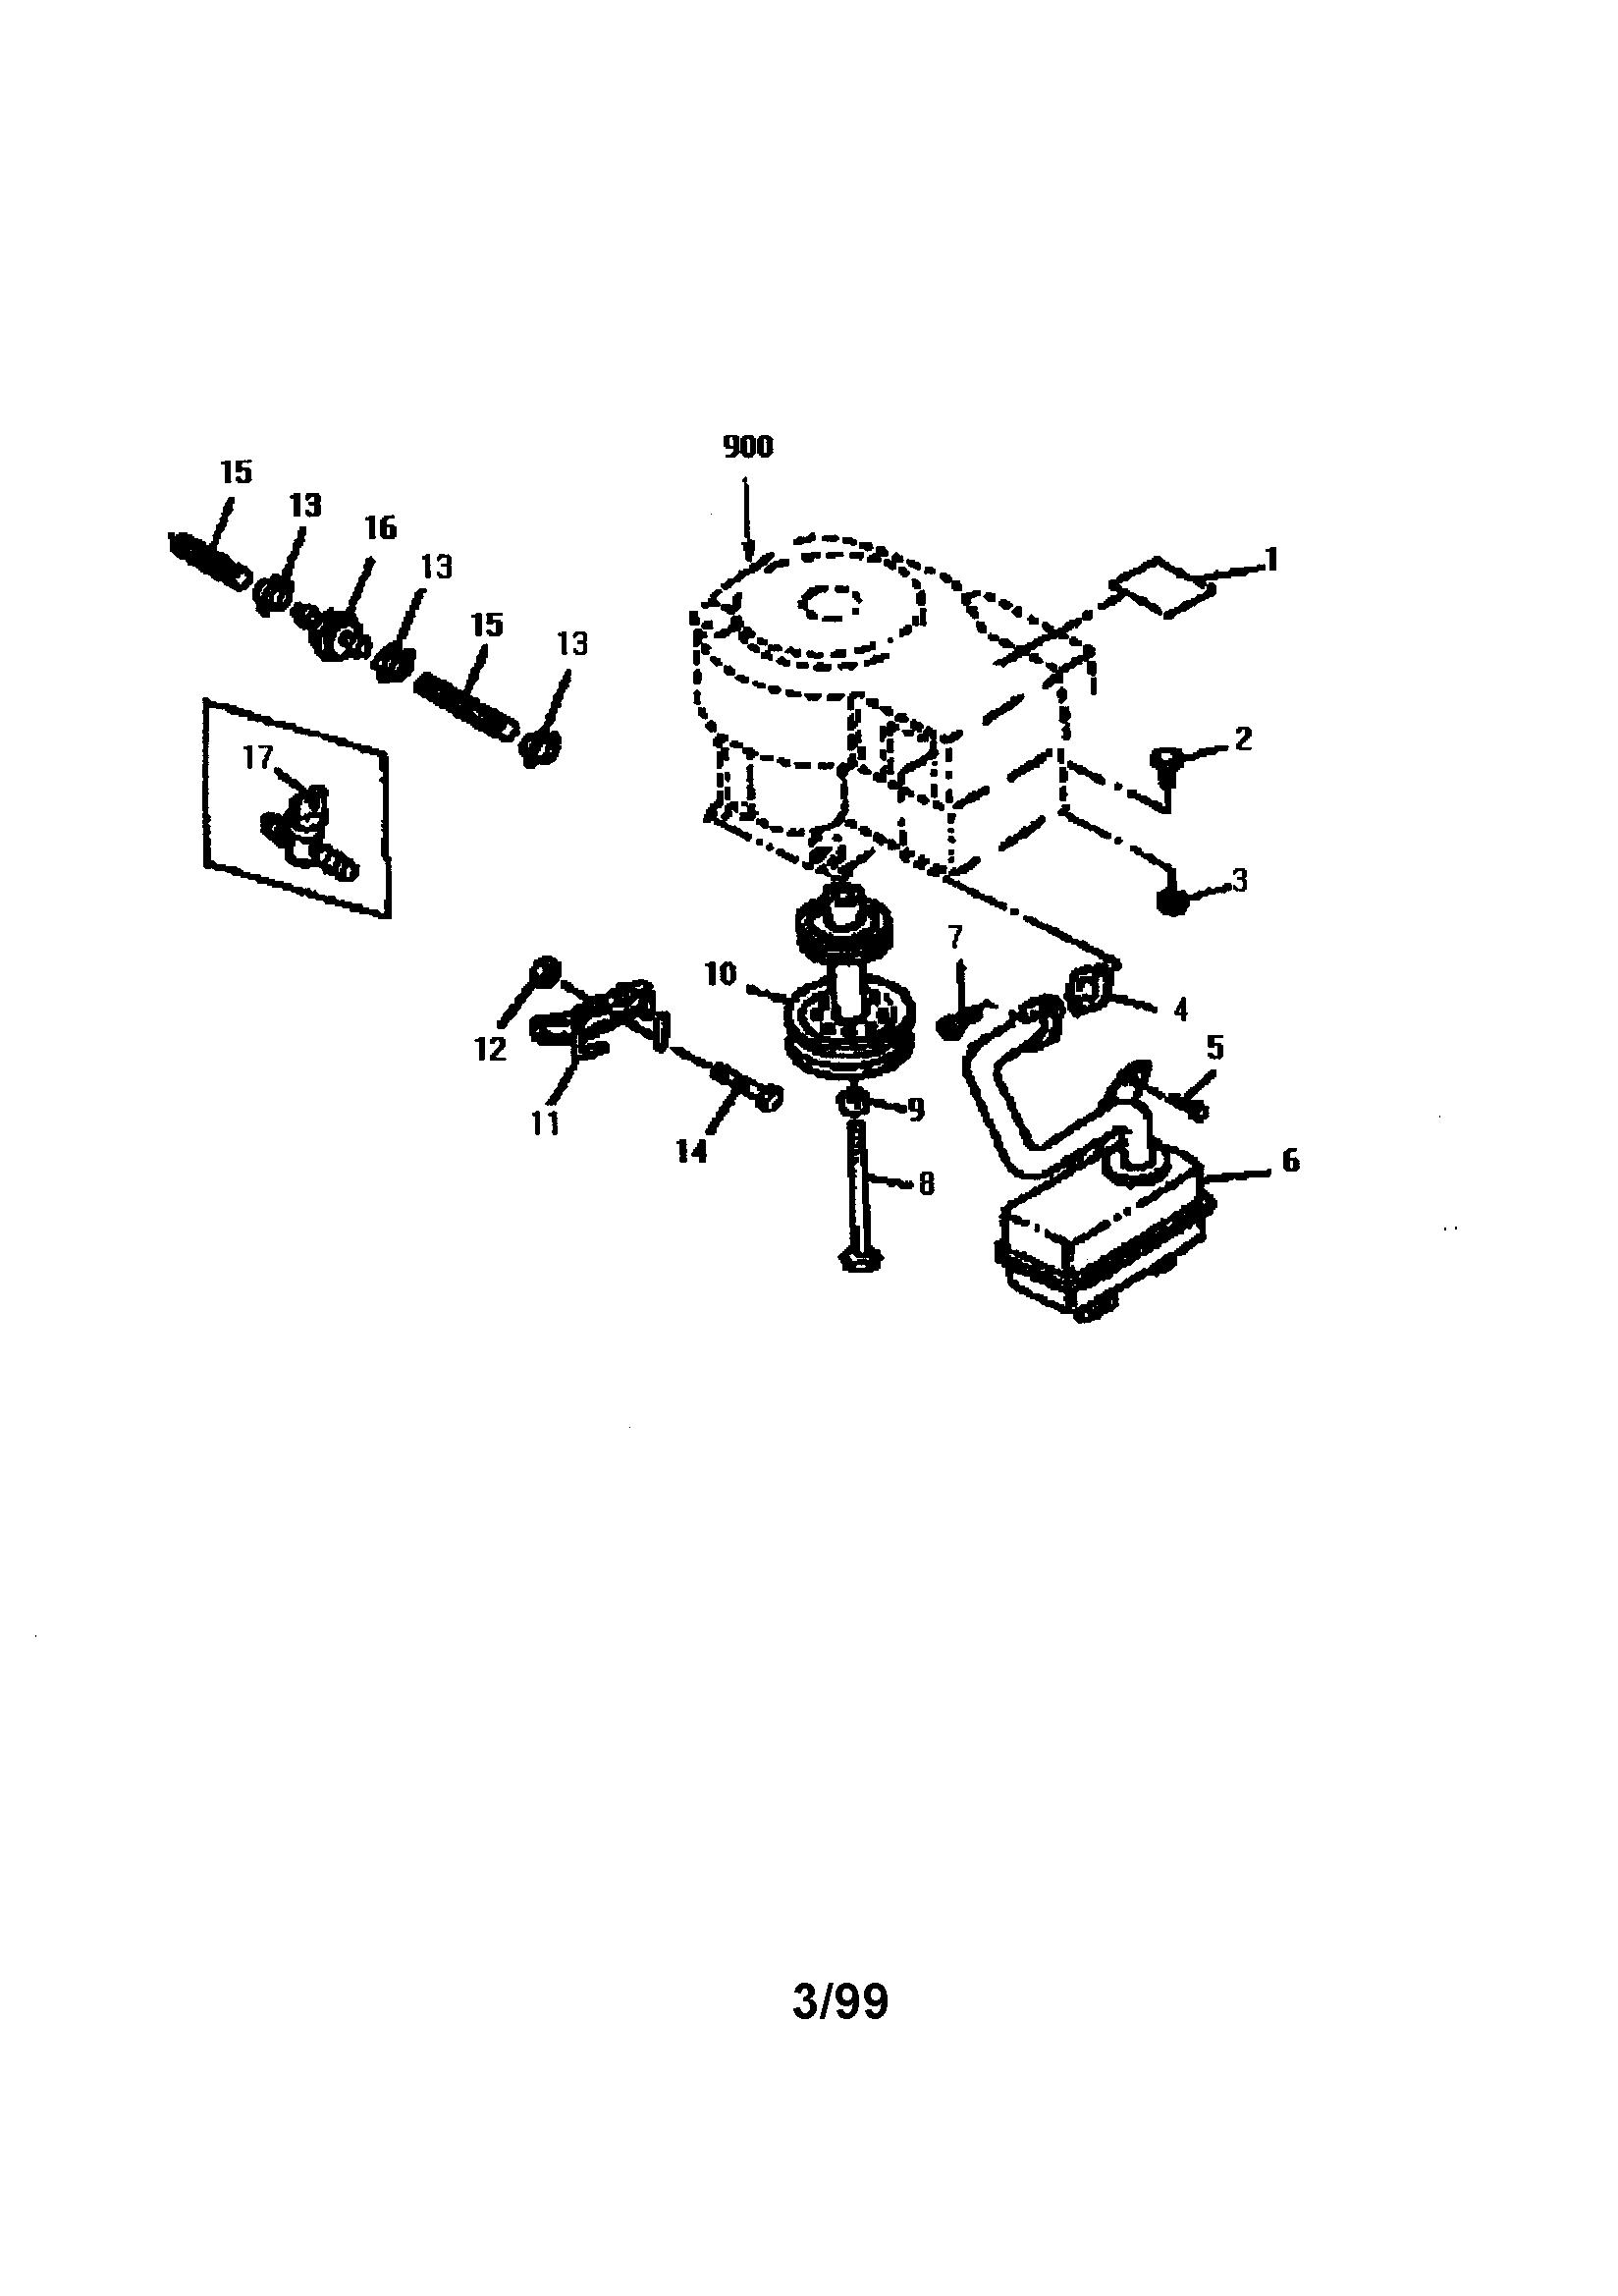 Sabre model 1538 HYDRO GXSABRB lawn, tractor genuine parts